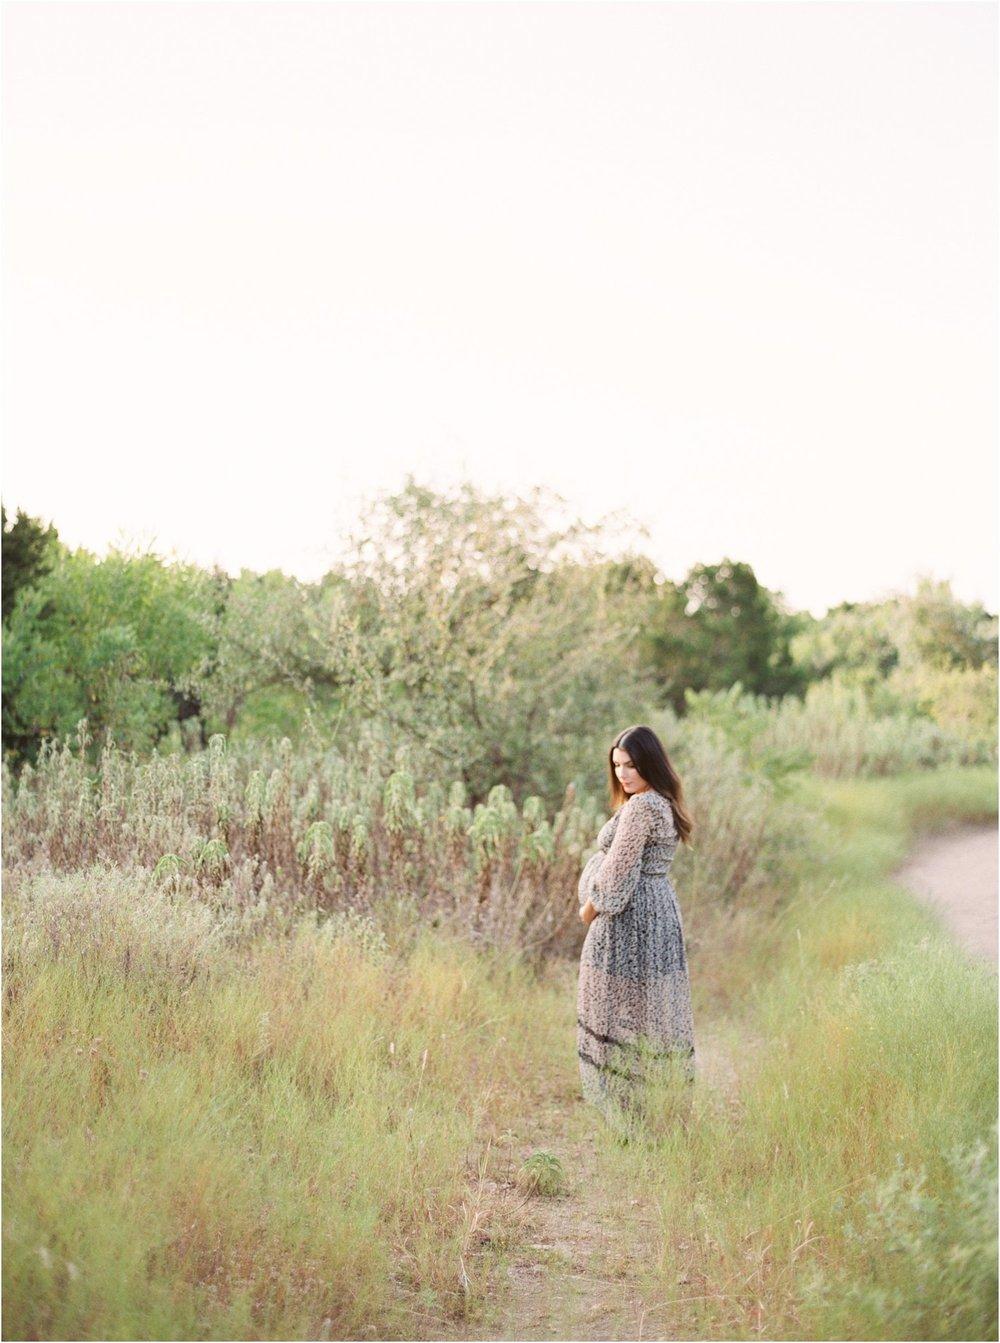 Fine Art Film Maternity Photographer - Jessica Christine Photography - Makenzi